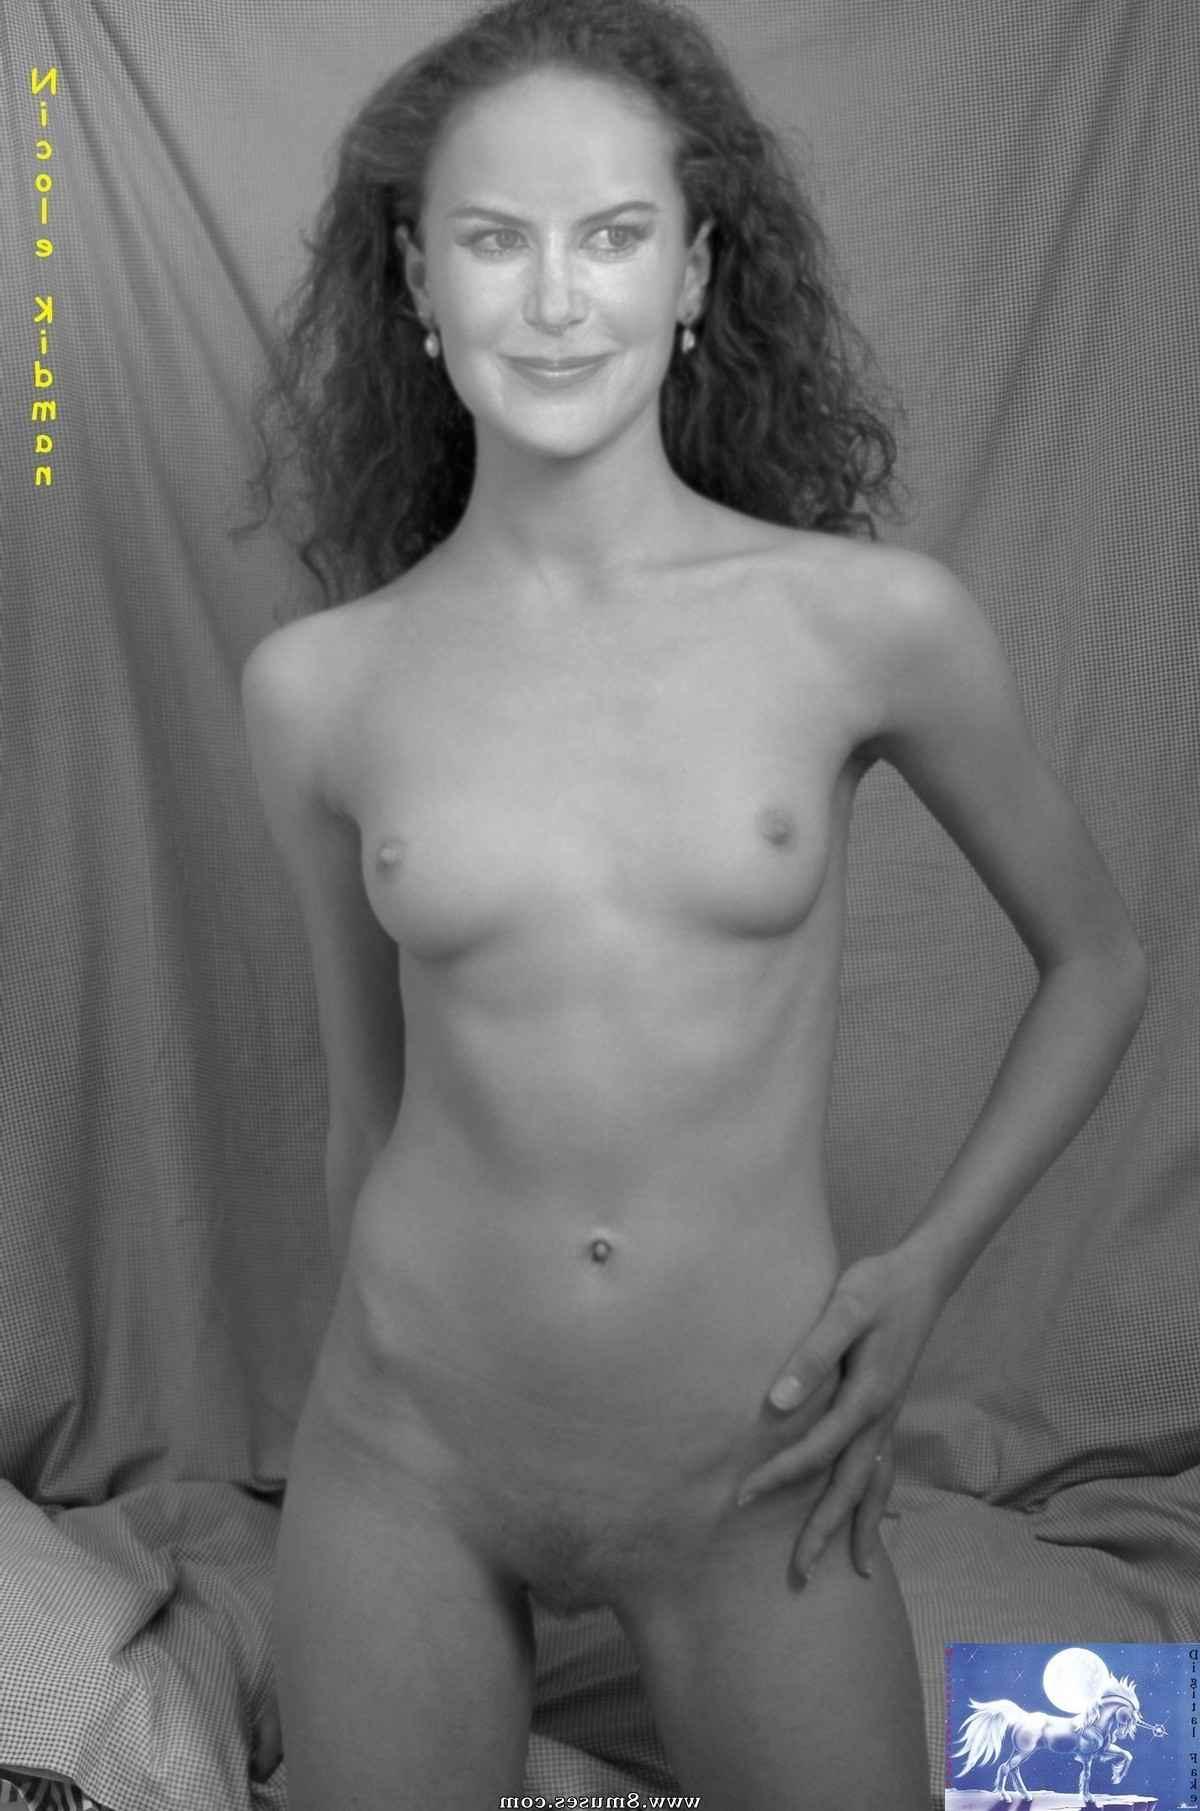 Fake-Celebrities-Sex-Pictures/Nicole-Kidman Nicole_Kidman__8muses_-_Sex_and_Porn_Comics_702.jpg